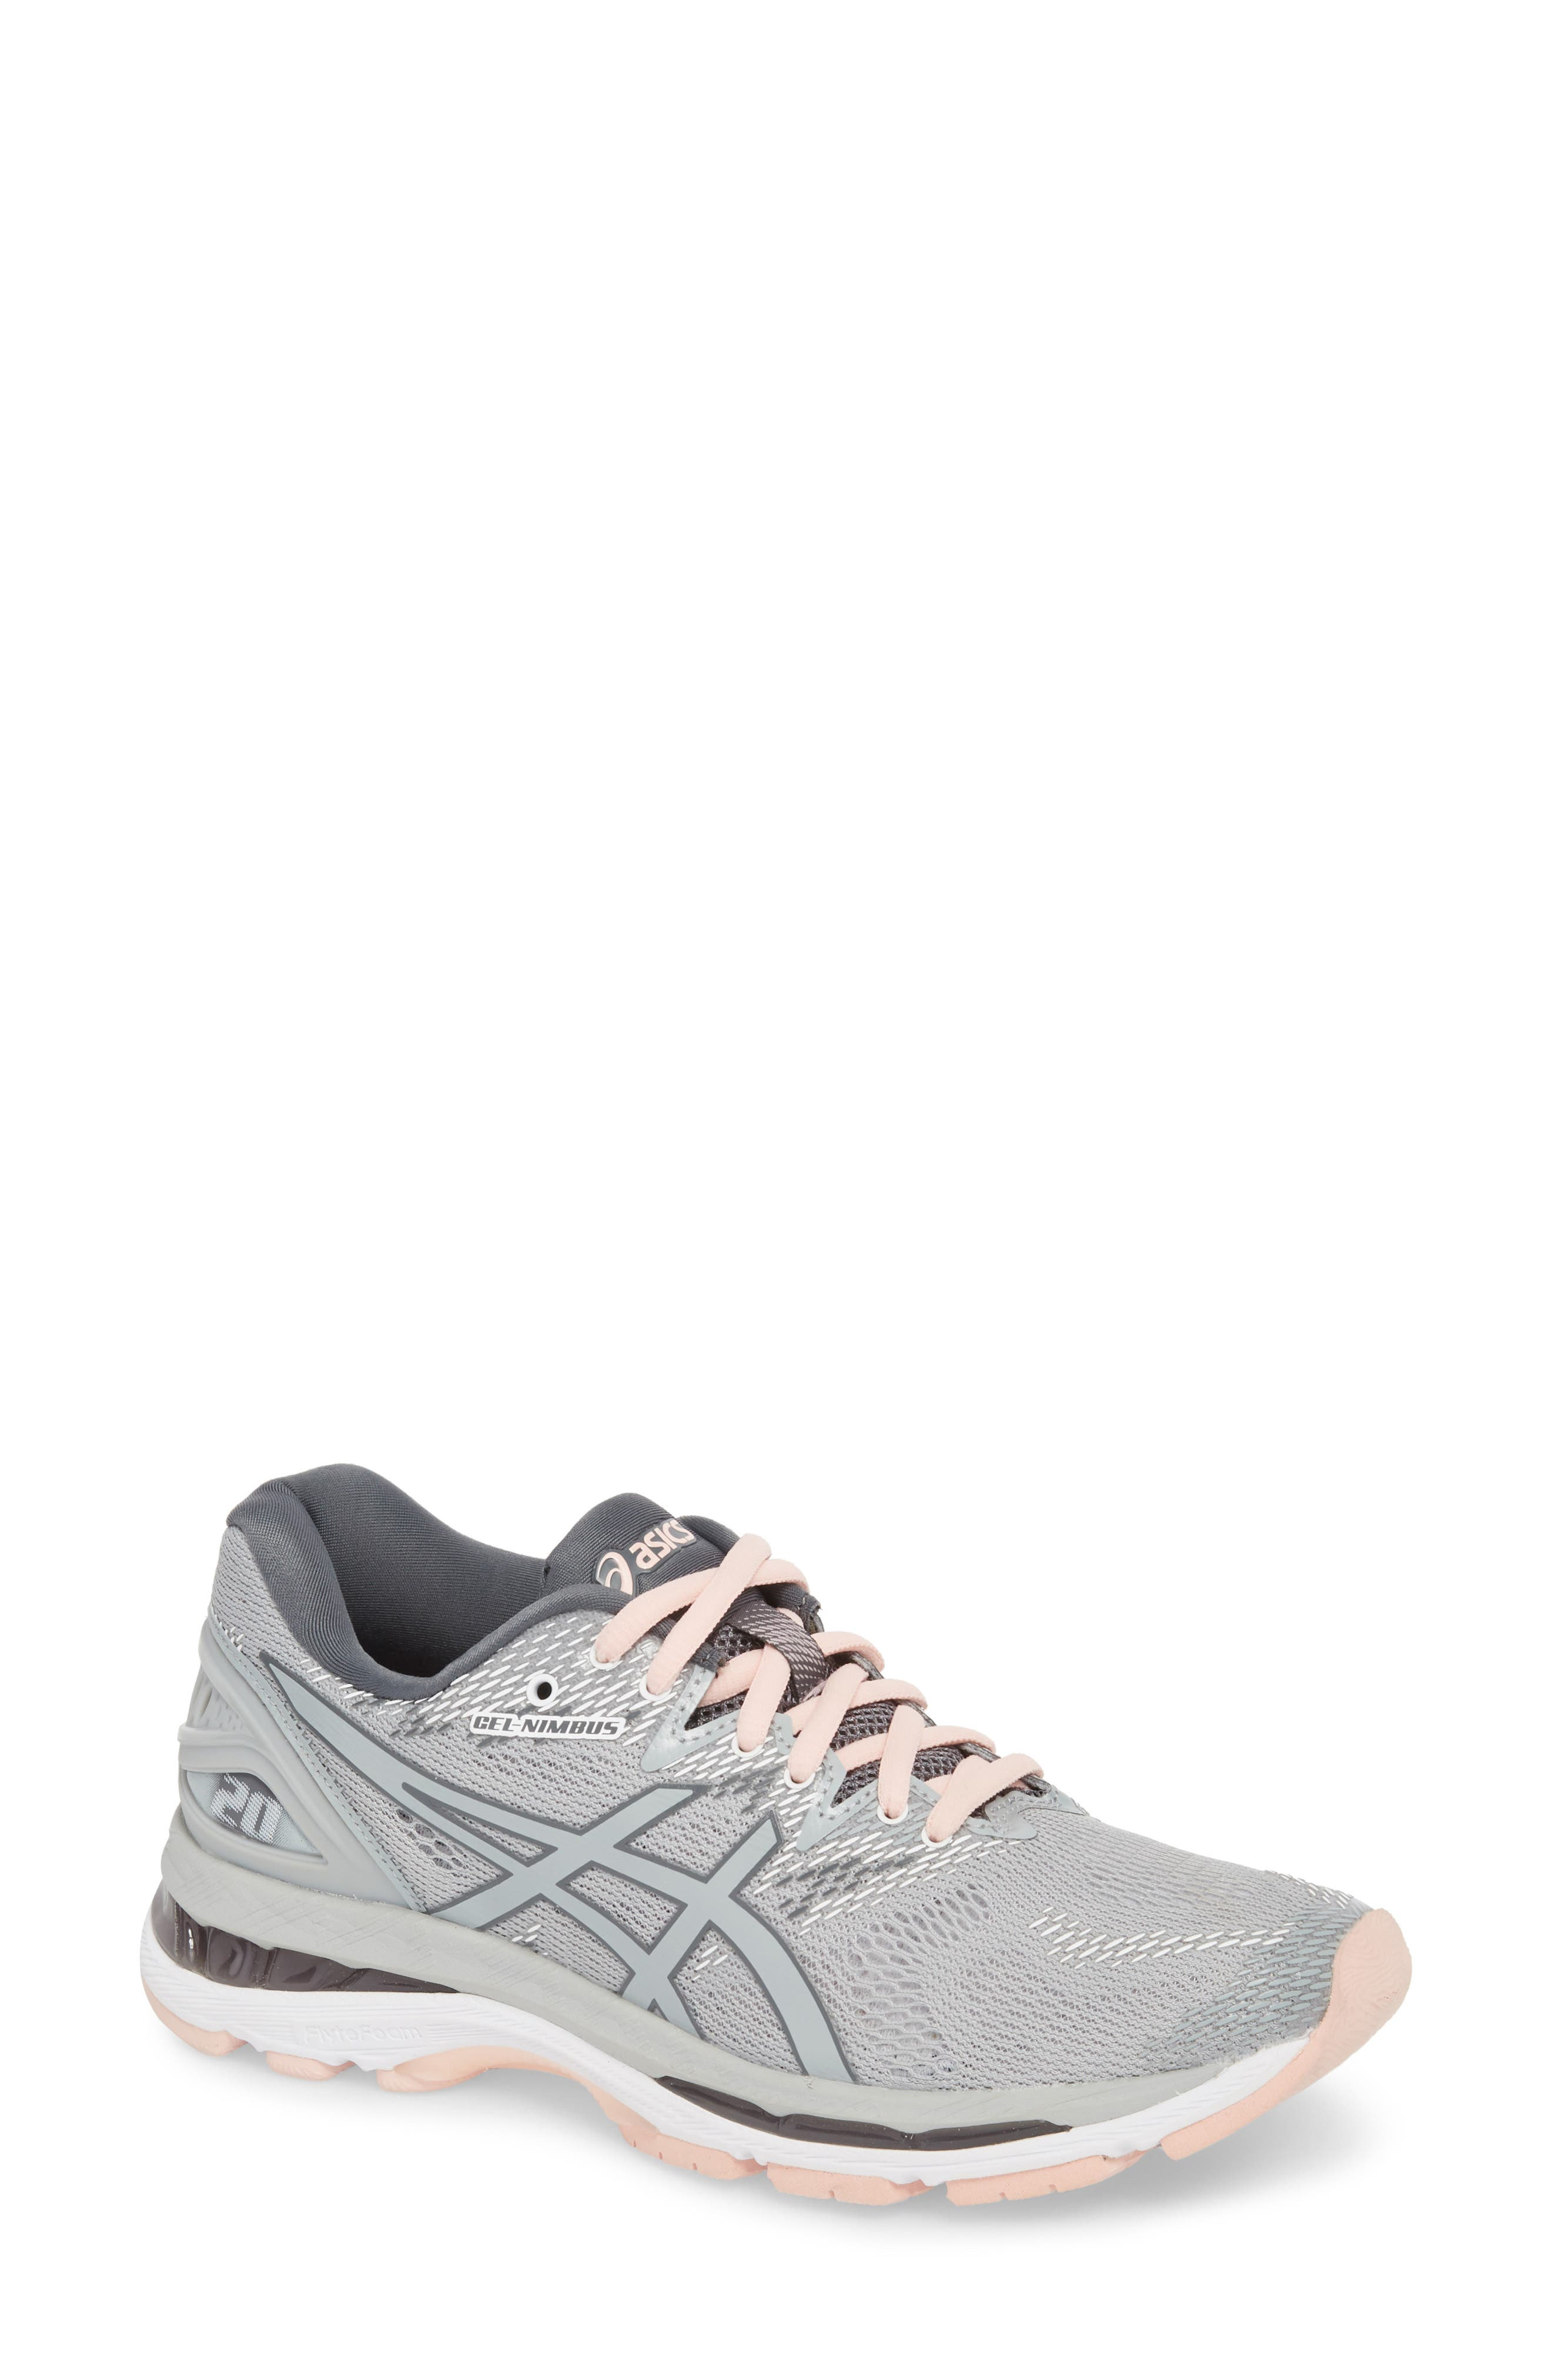 GEL<sup>®</sup>-Nimbus 20 Running Shoe,                         Main,                         color, MID GREY/ SEASHELL PINK